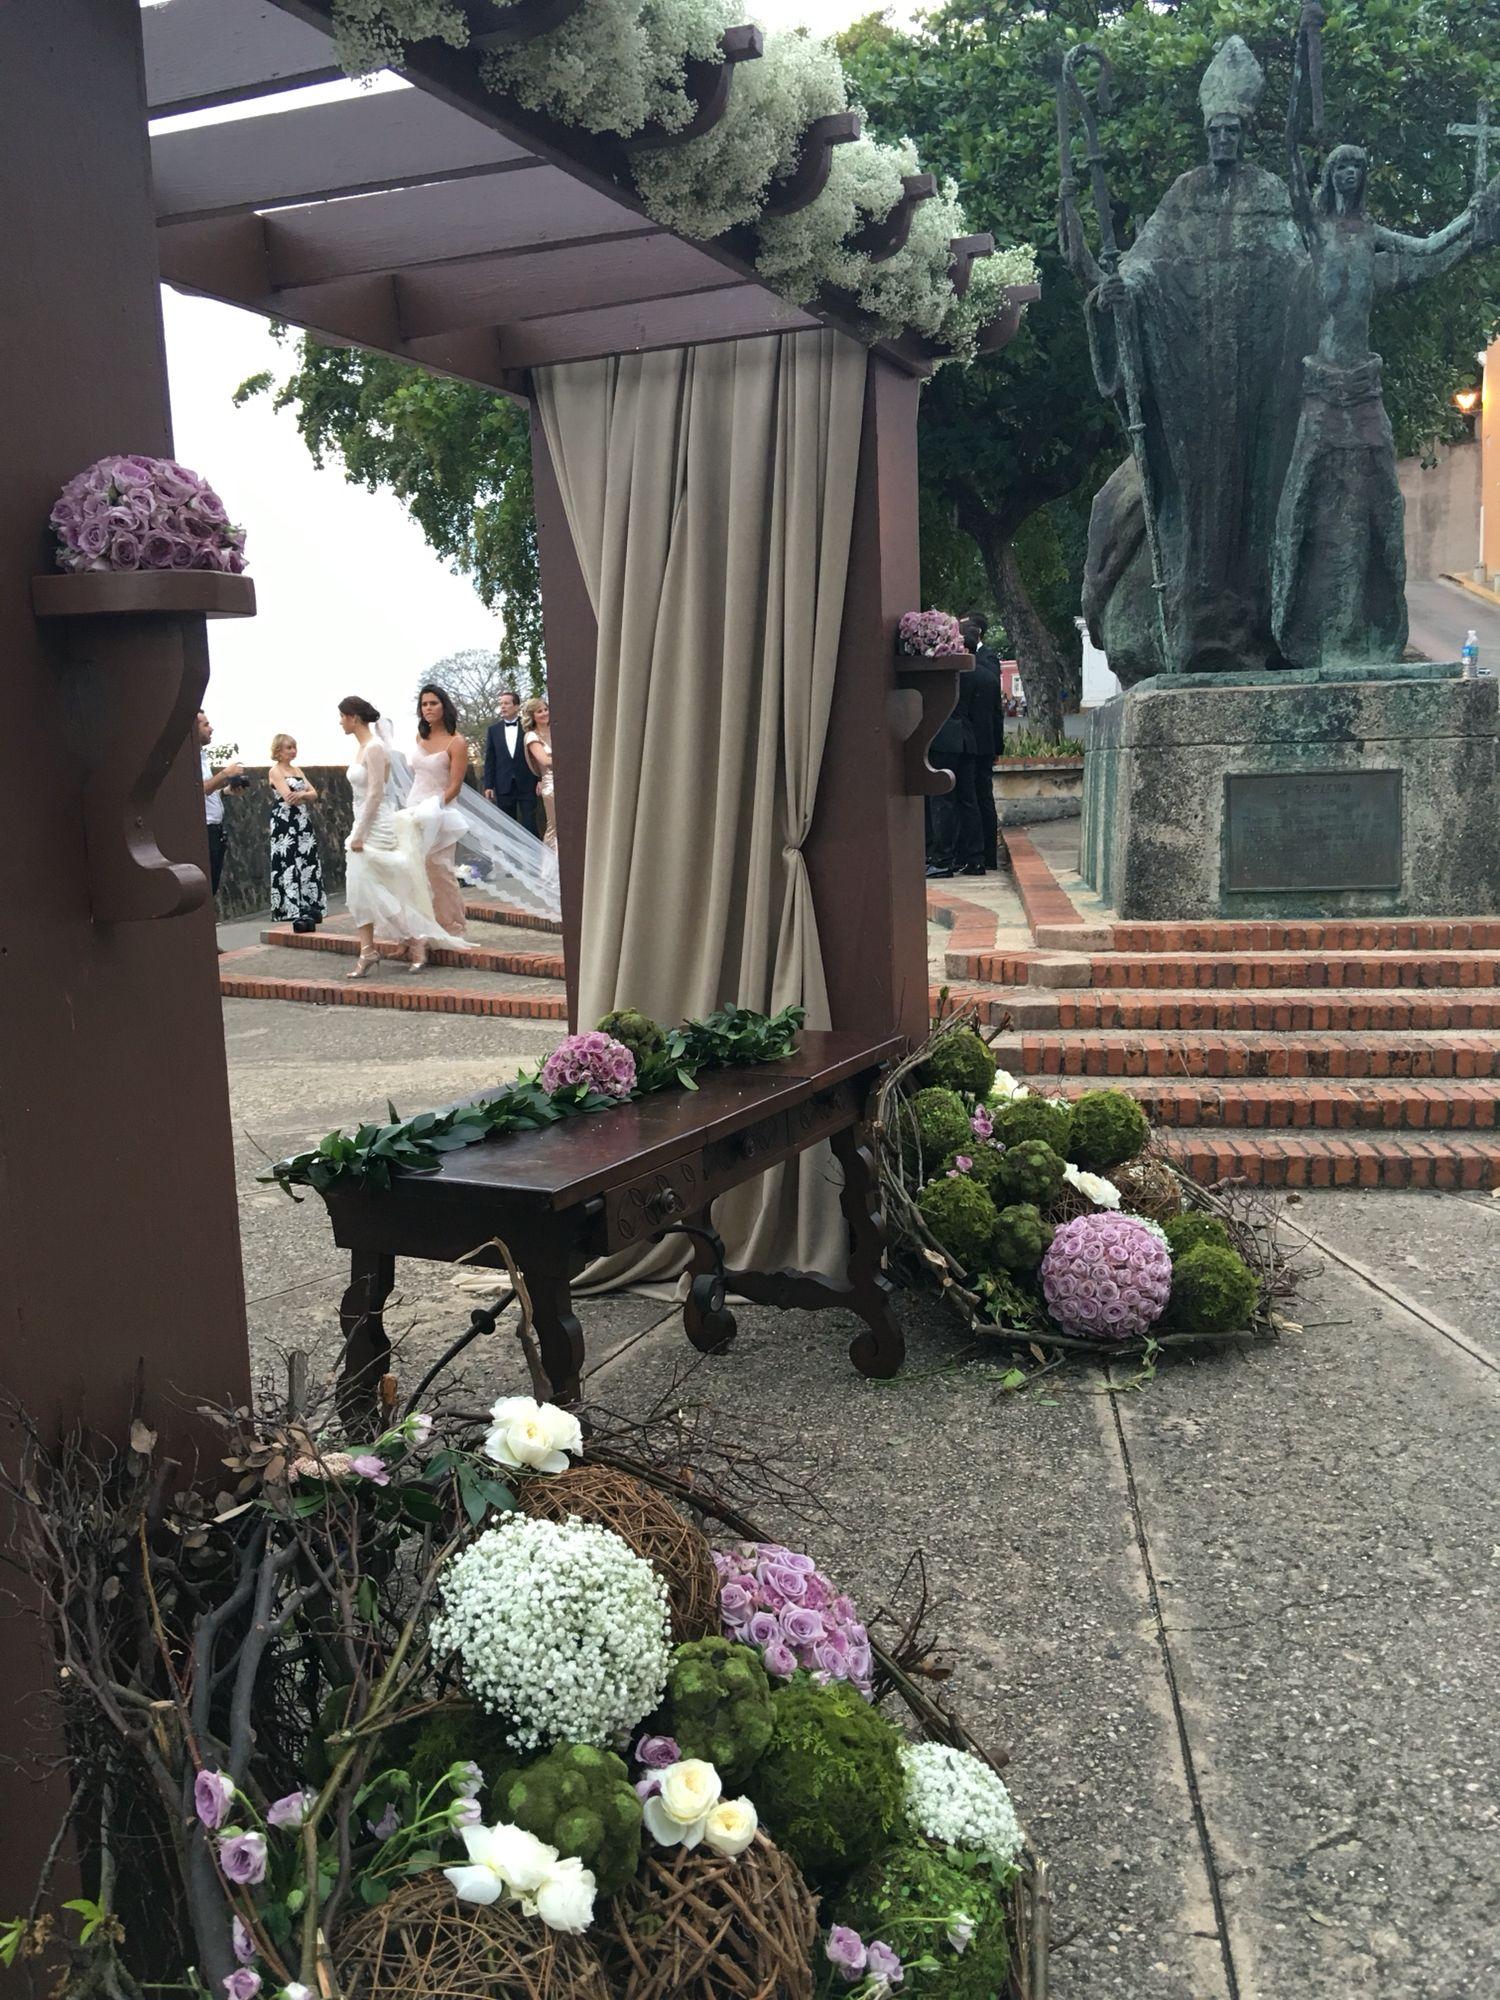 Canopy Ceremony at the Park  #destinationweddings #weddingideas #destinationweddingspuertorico #justengaged #bridetobe #weddingplanner #mariaalugo #bridebook By Maria Lugo,AWC Destination Wedding Planner marialugopr.com 787-548-5561 mariaalugo@gmail.com